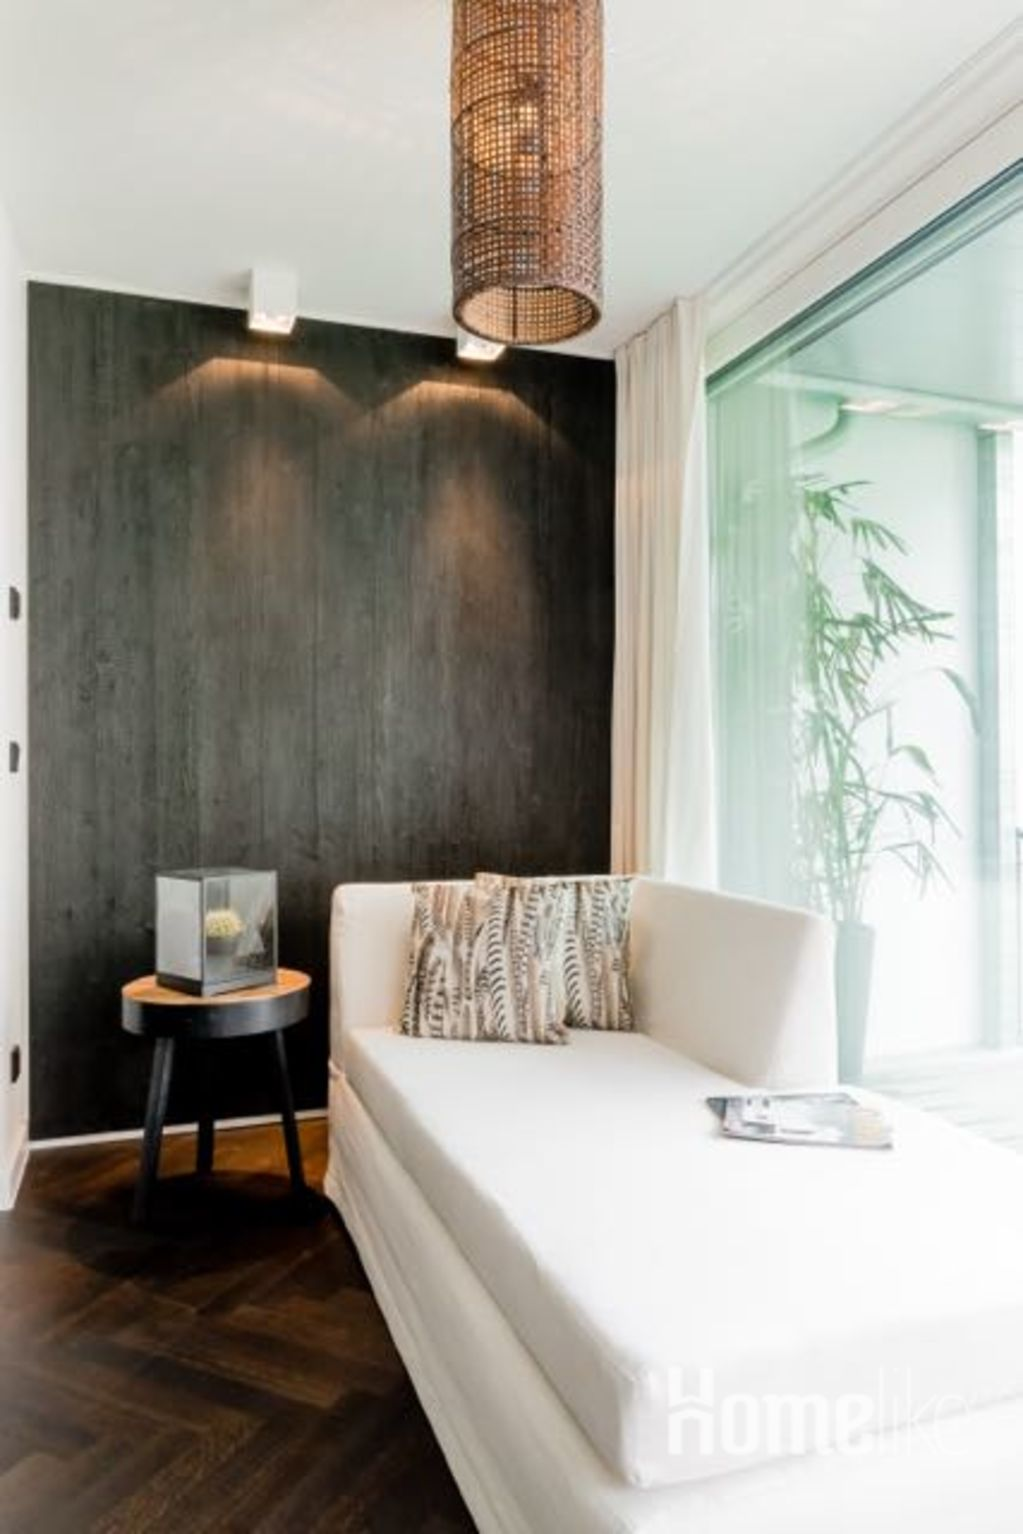 image 7 furnished 2 bedroom Apartment for rent in Dusseltal, Dusseldorf